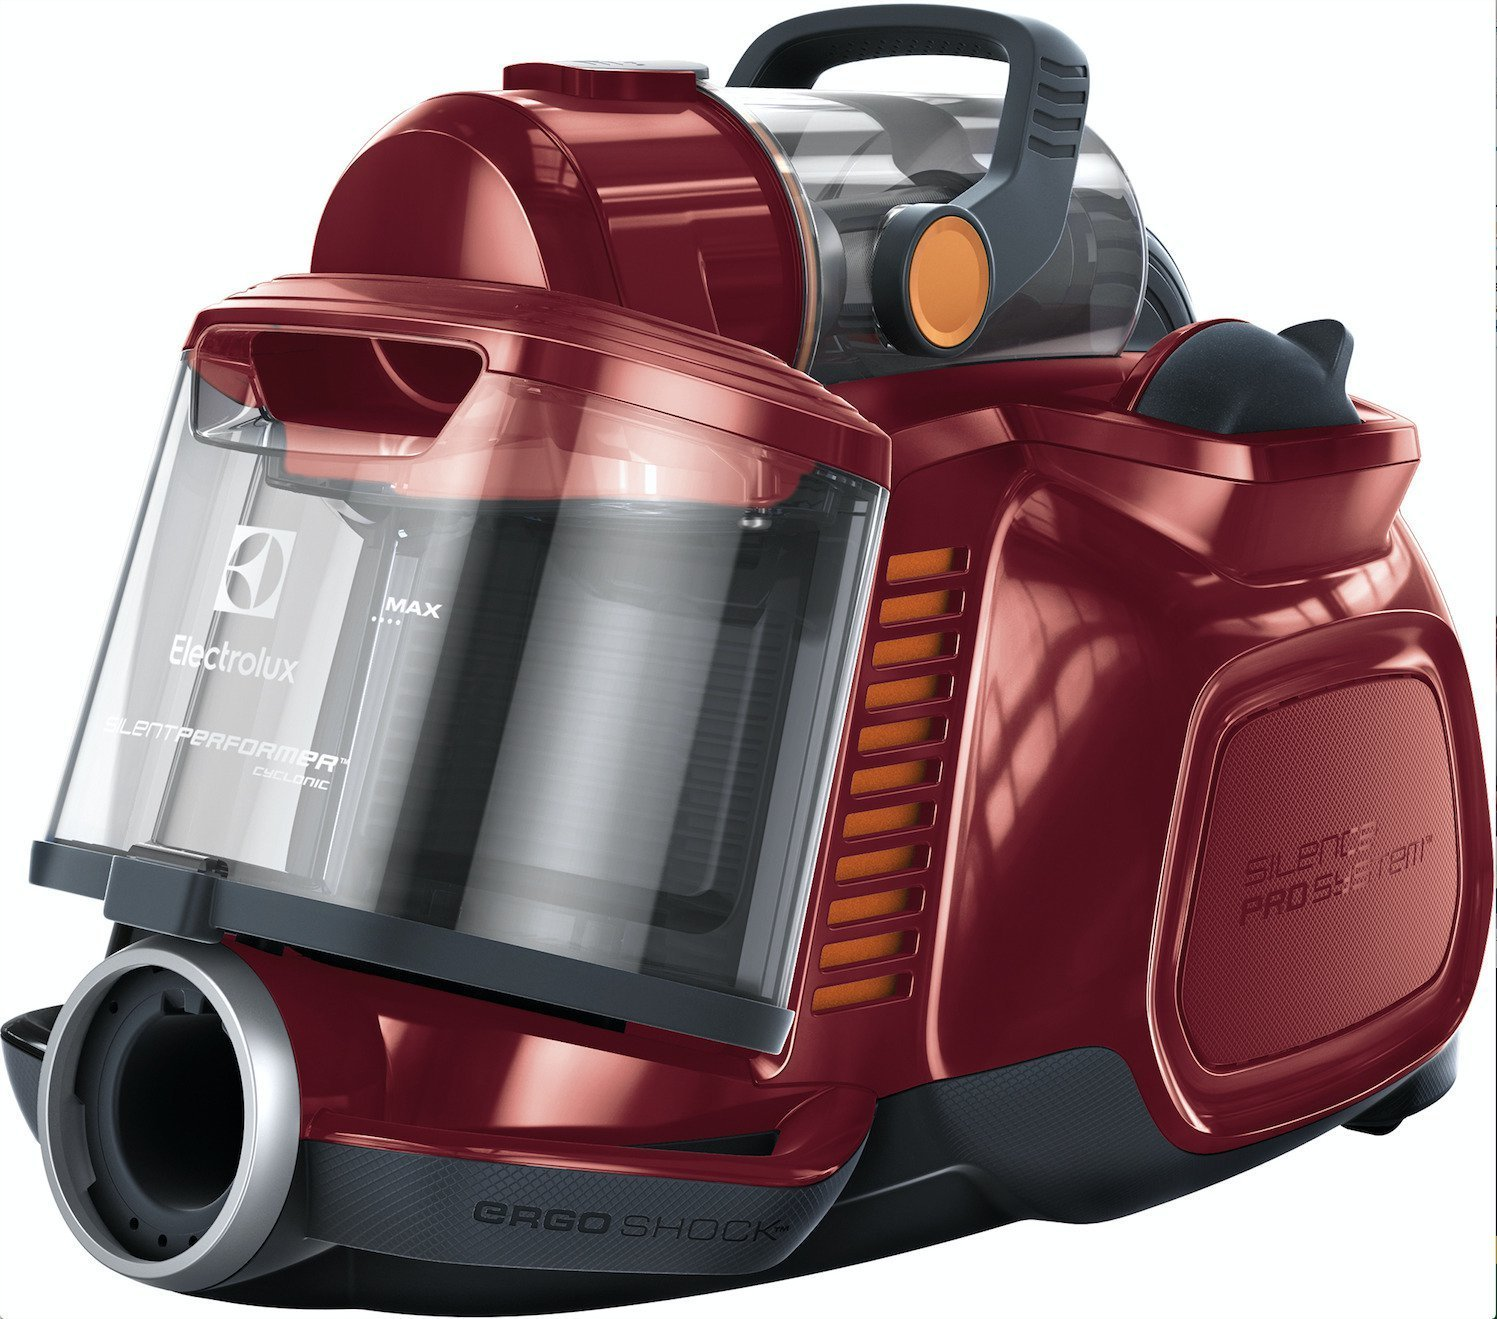 Electrolux SilentPerformer Cyclonic ESPC72RR kotita tolmuimeja